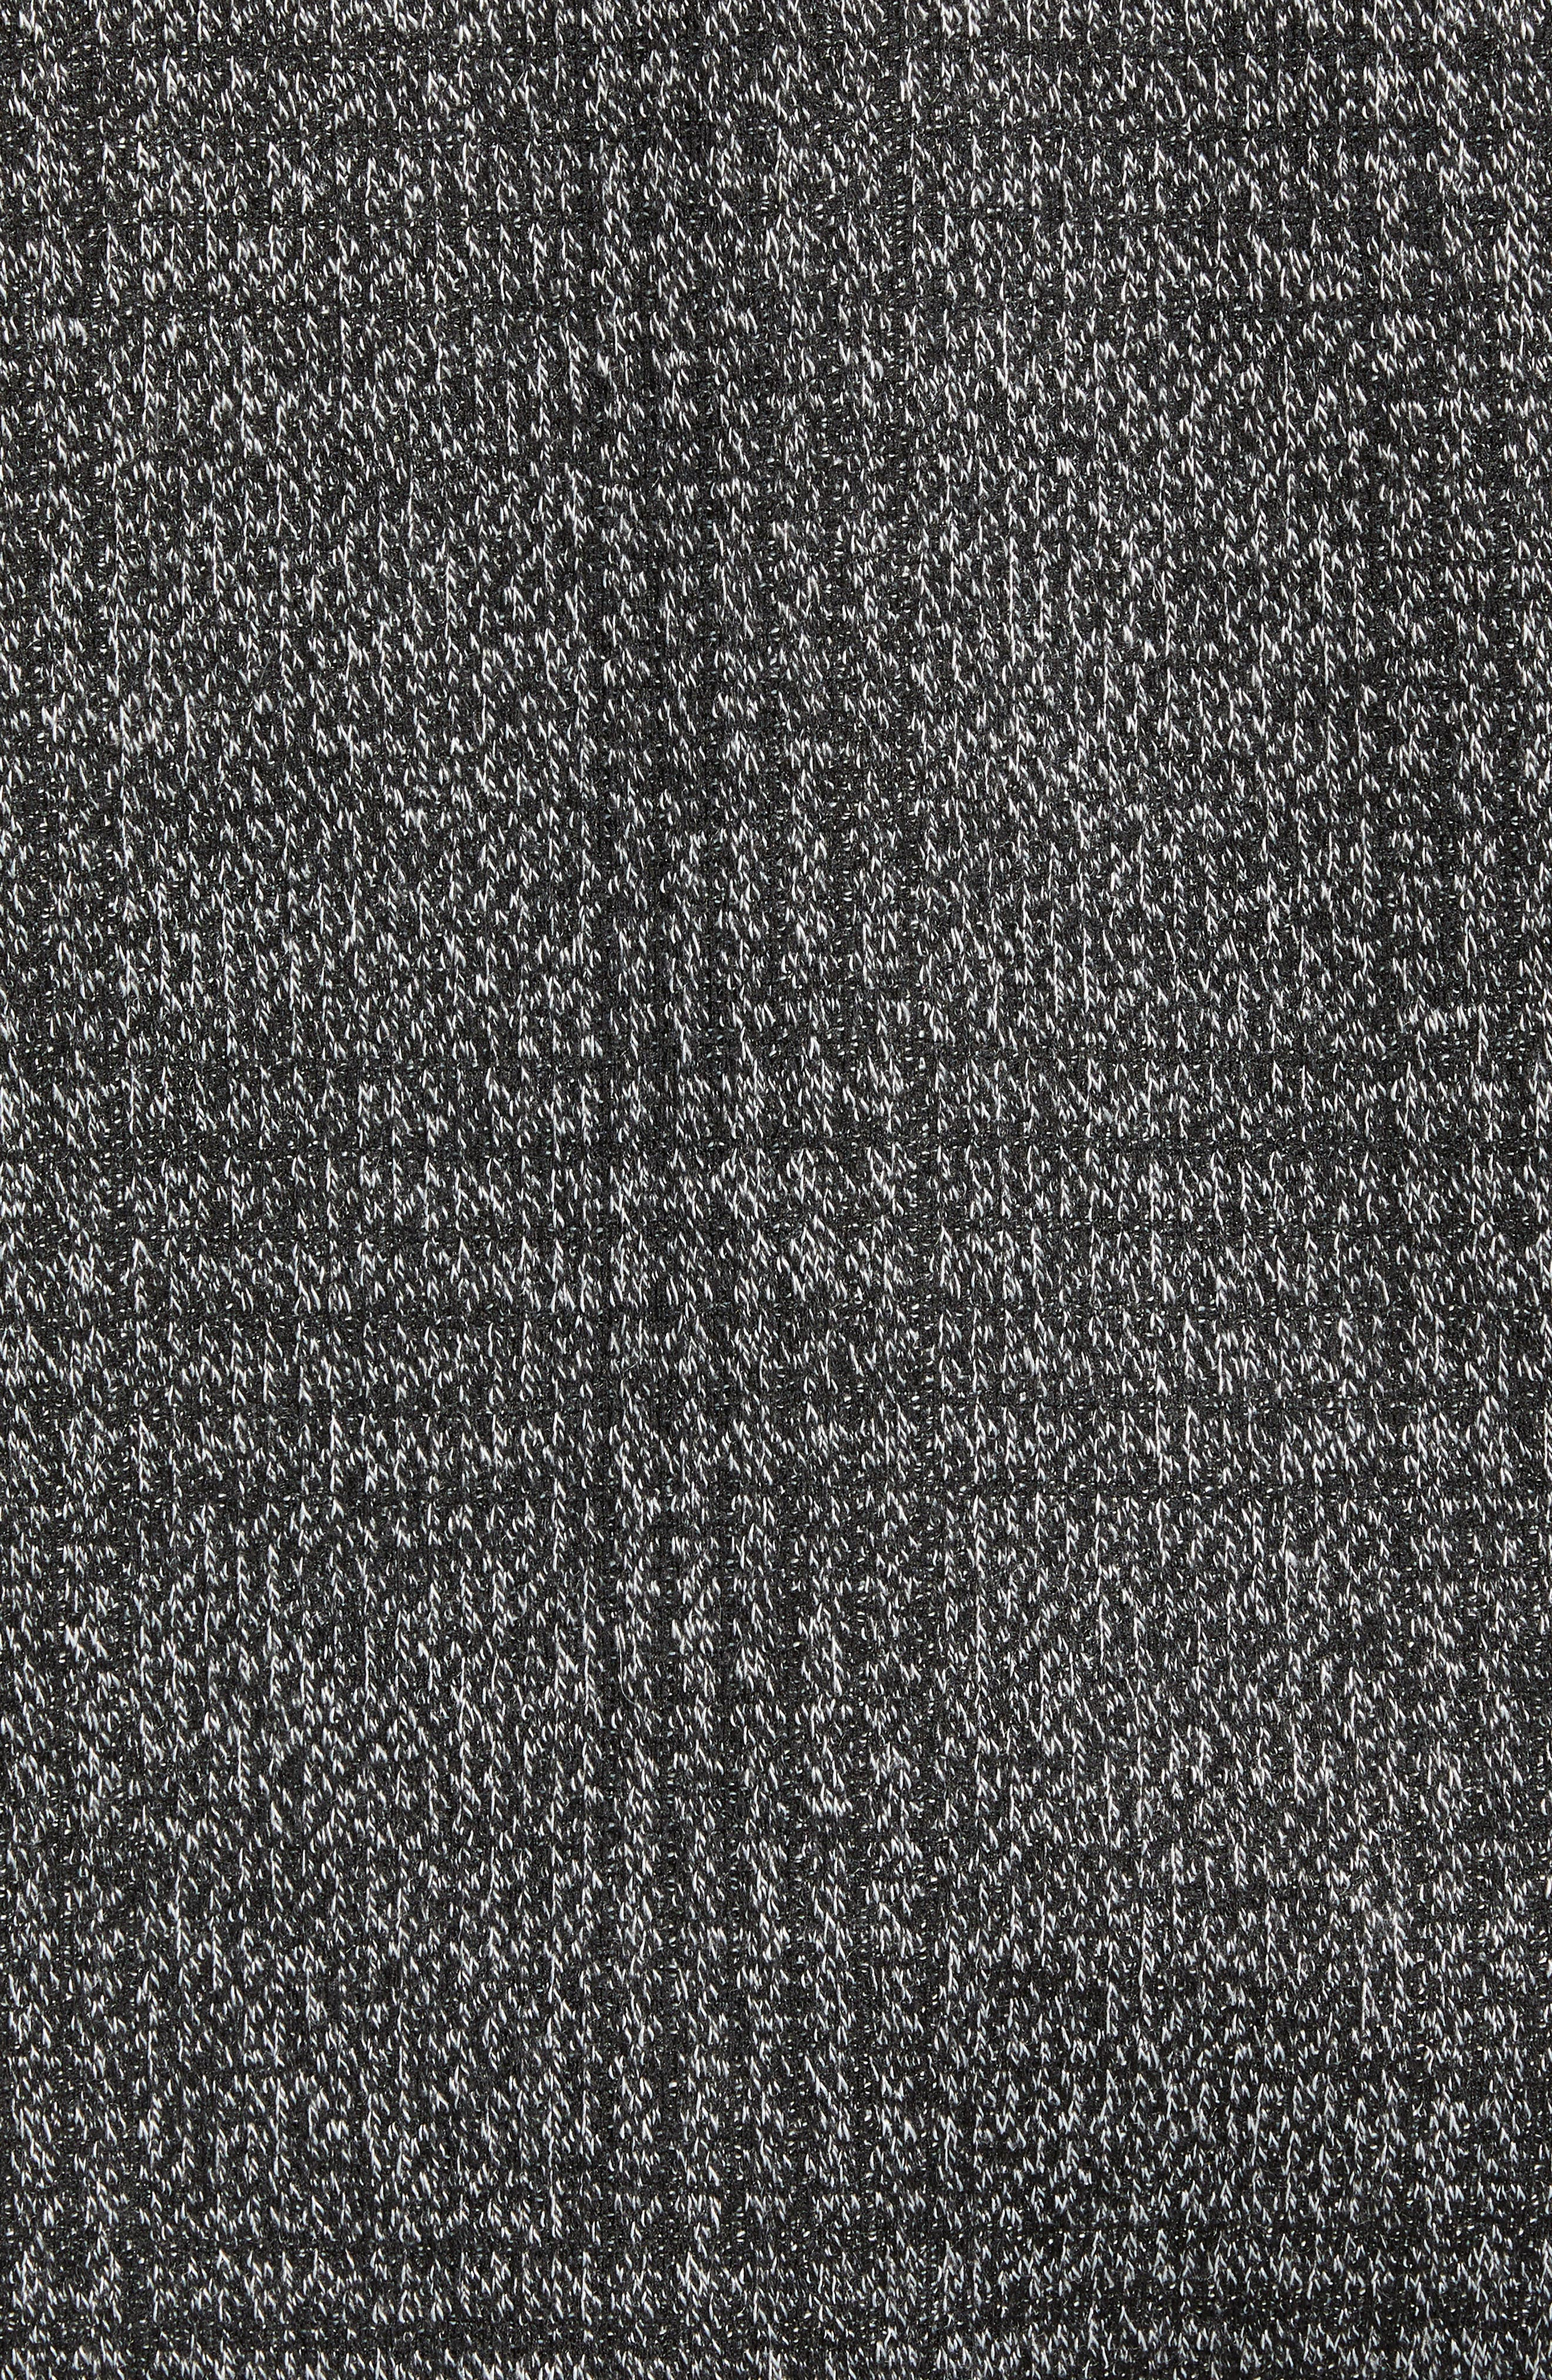 Slim Fit Plaid Knit Bomber Jacket,                             Alternate thumbnail 7, color,                             CHARCOAL PLAID